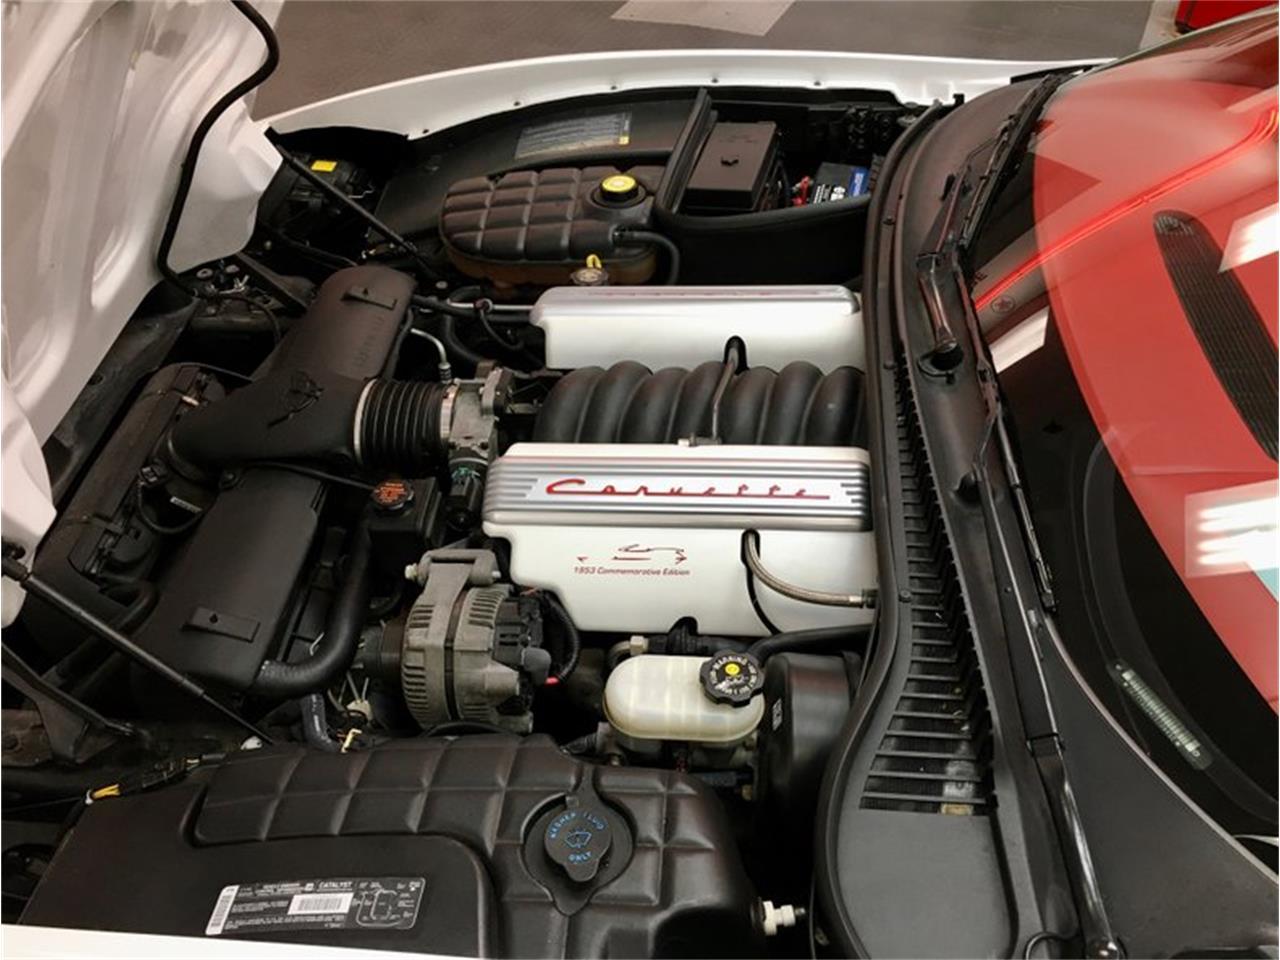 2003 Chevrolet Corvette (CC-1415558) for sale in Dothan, Alabama